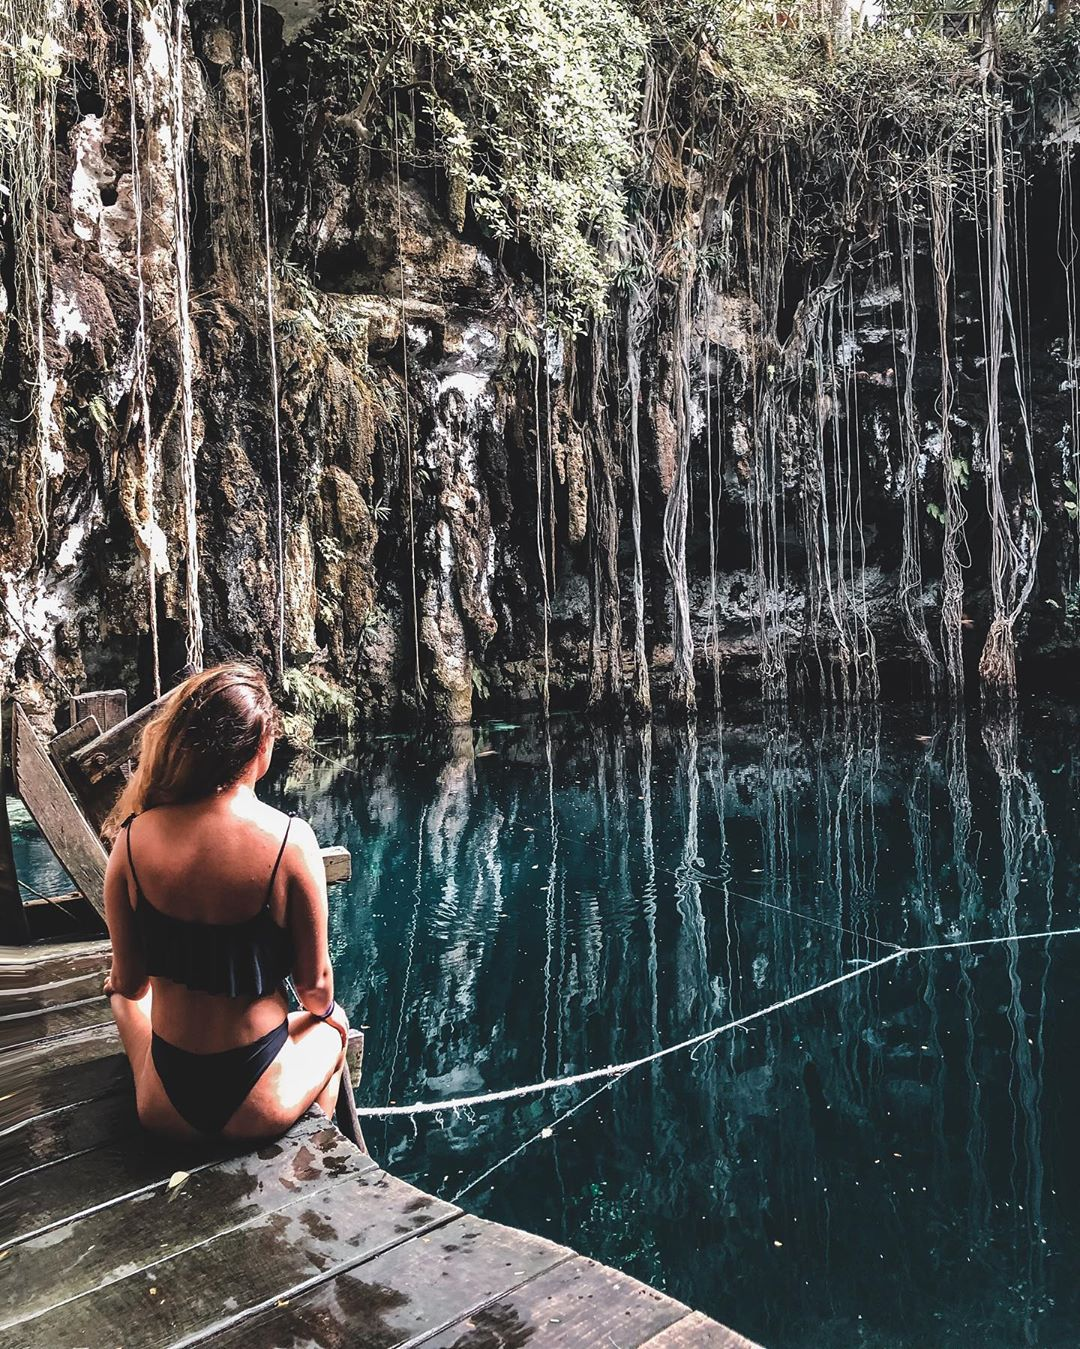 cenote yokdzonot, los mejores cenotes de yucatan, top yucatan cenotes hermosos